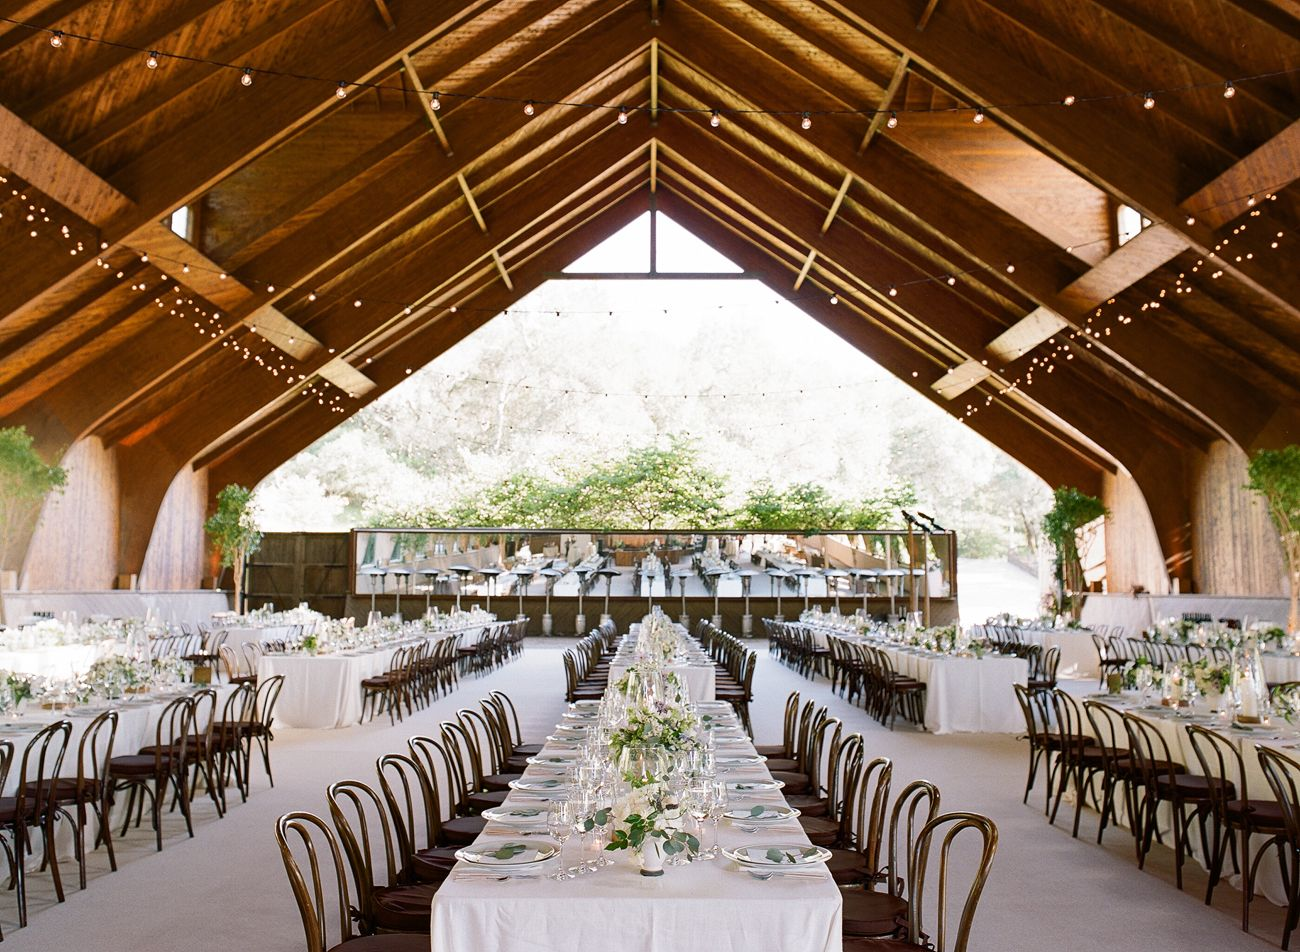 A Fresh Take On A Rustic Wedding In California Wine Country Rustic Modern Wedding Napa Wedding Venues Wine Country Wedding